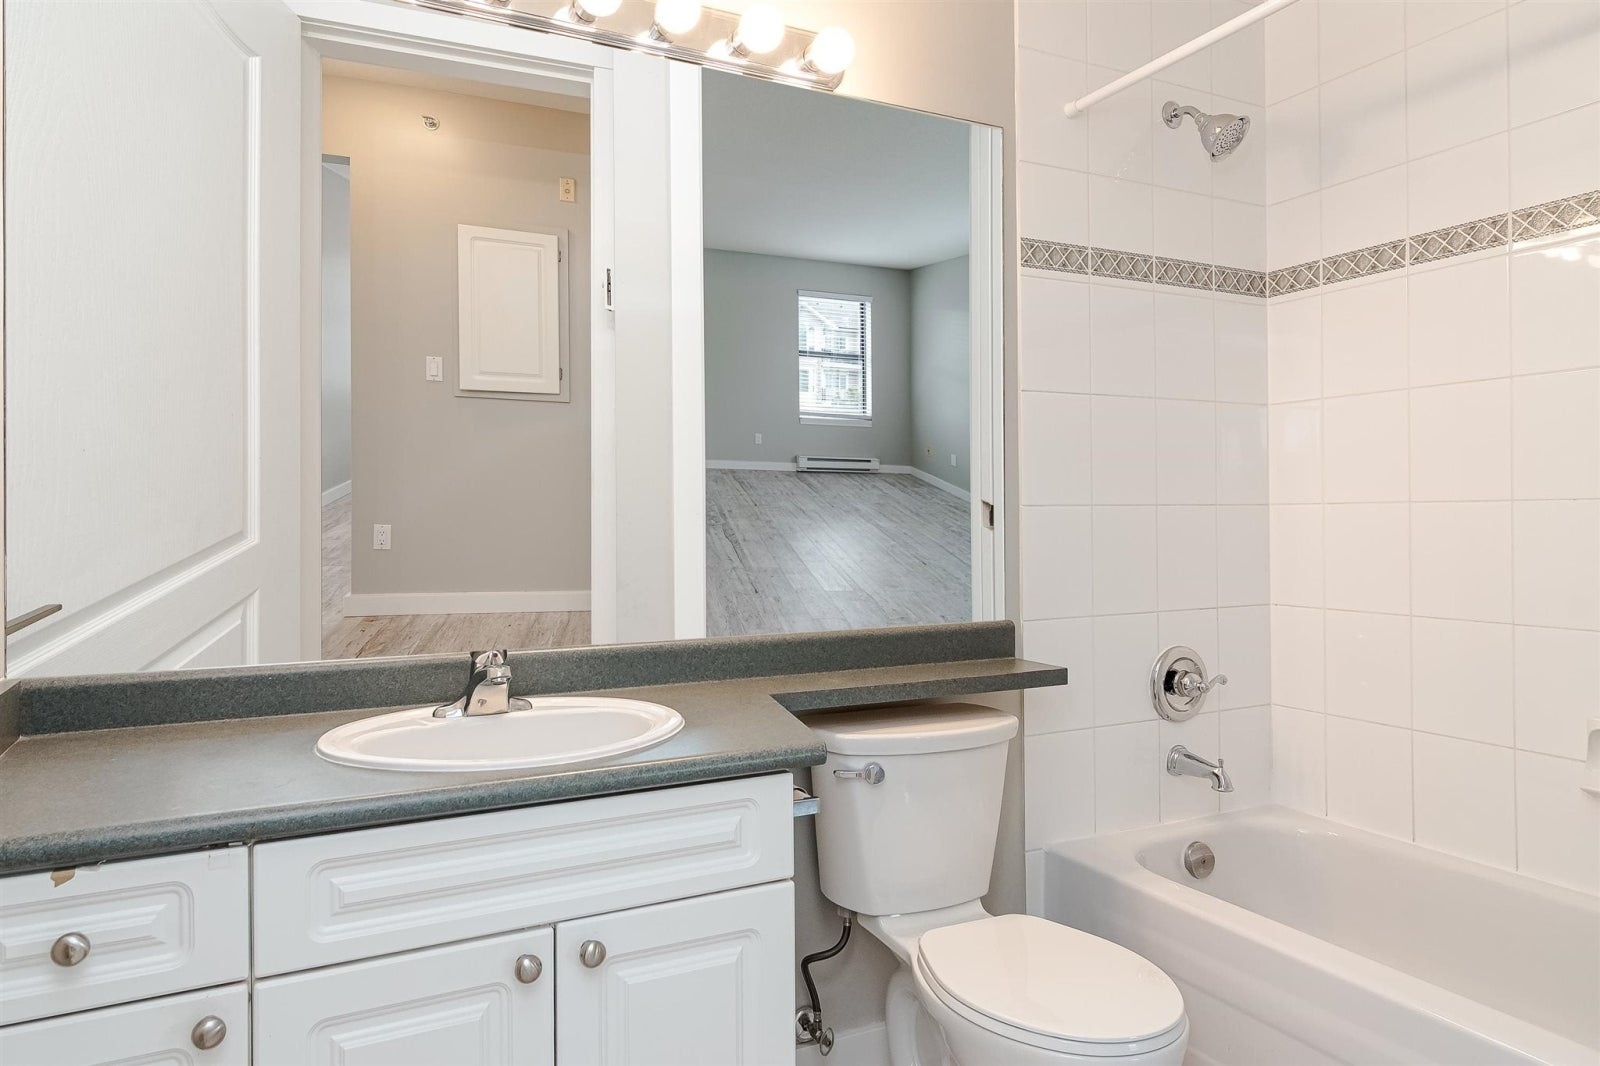 405 20268 54 AVENUE - Langley City Apartment/Condo for sale, 2 Bedrooms (R2604183) #16